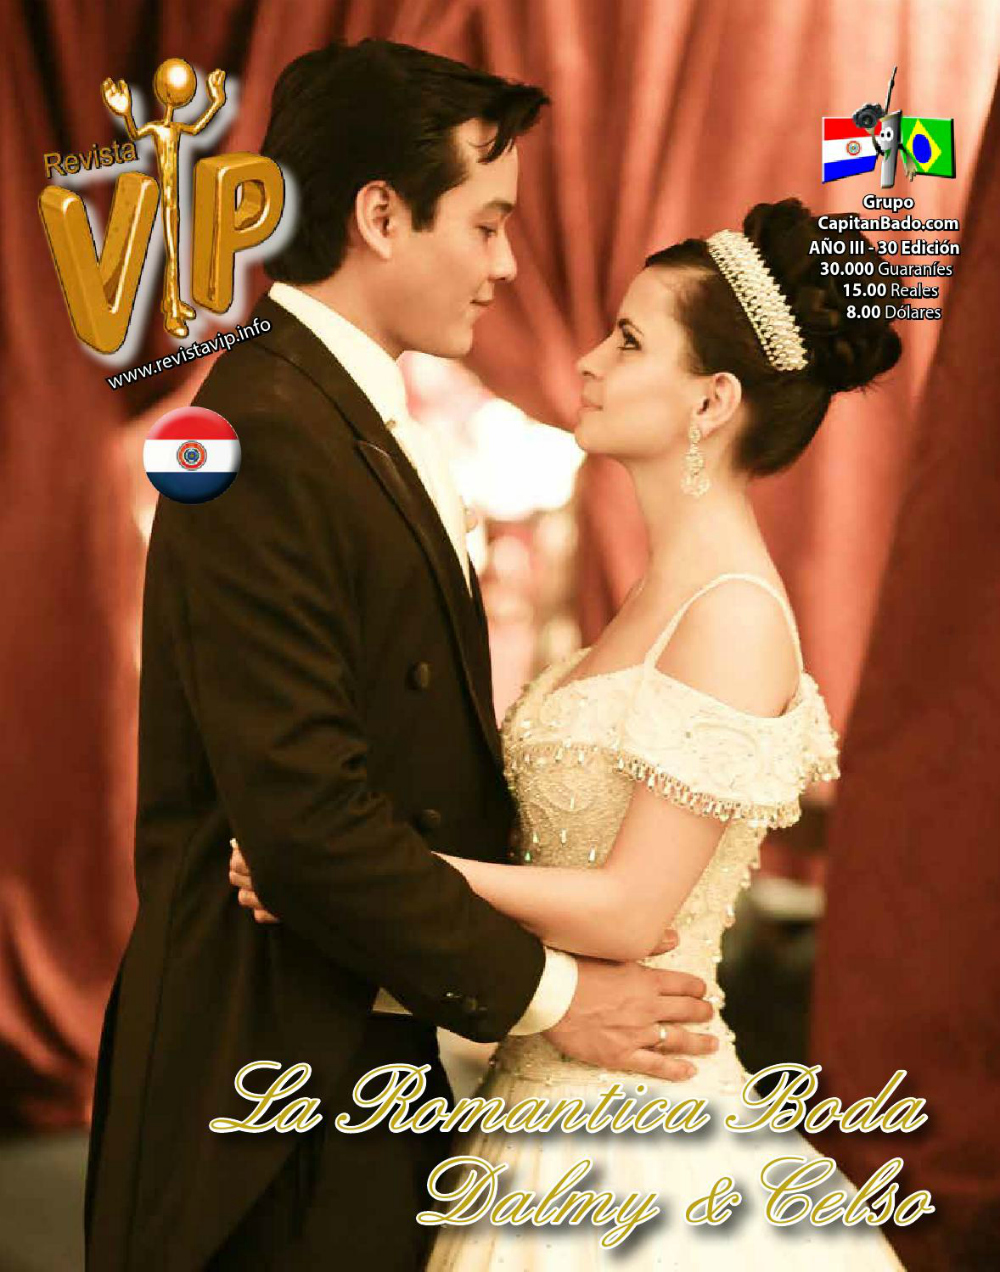 Vip 30 Paraguay